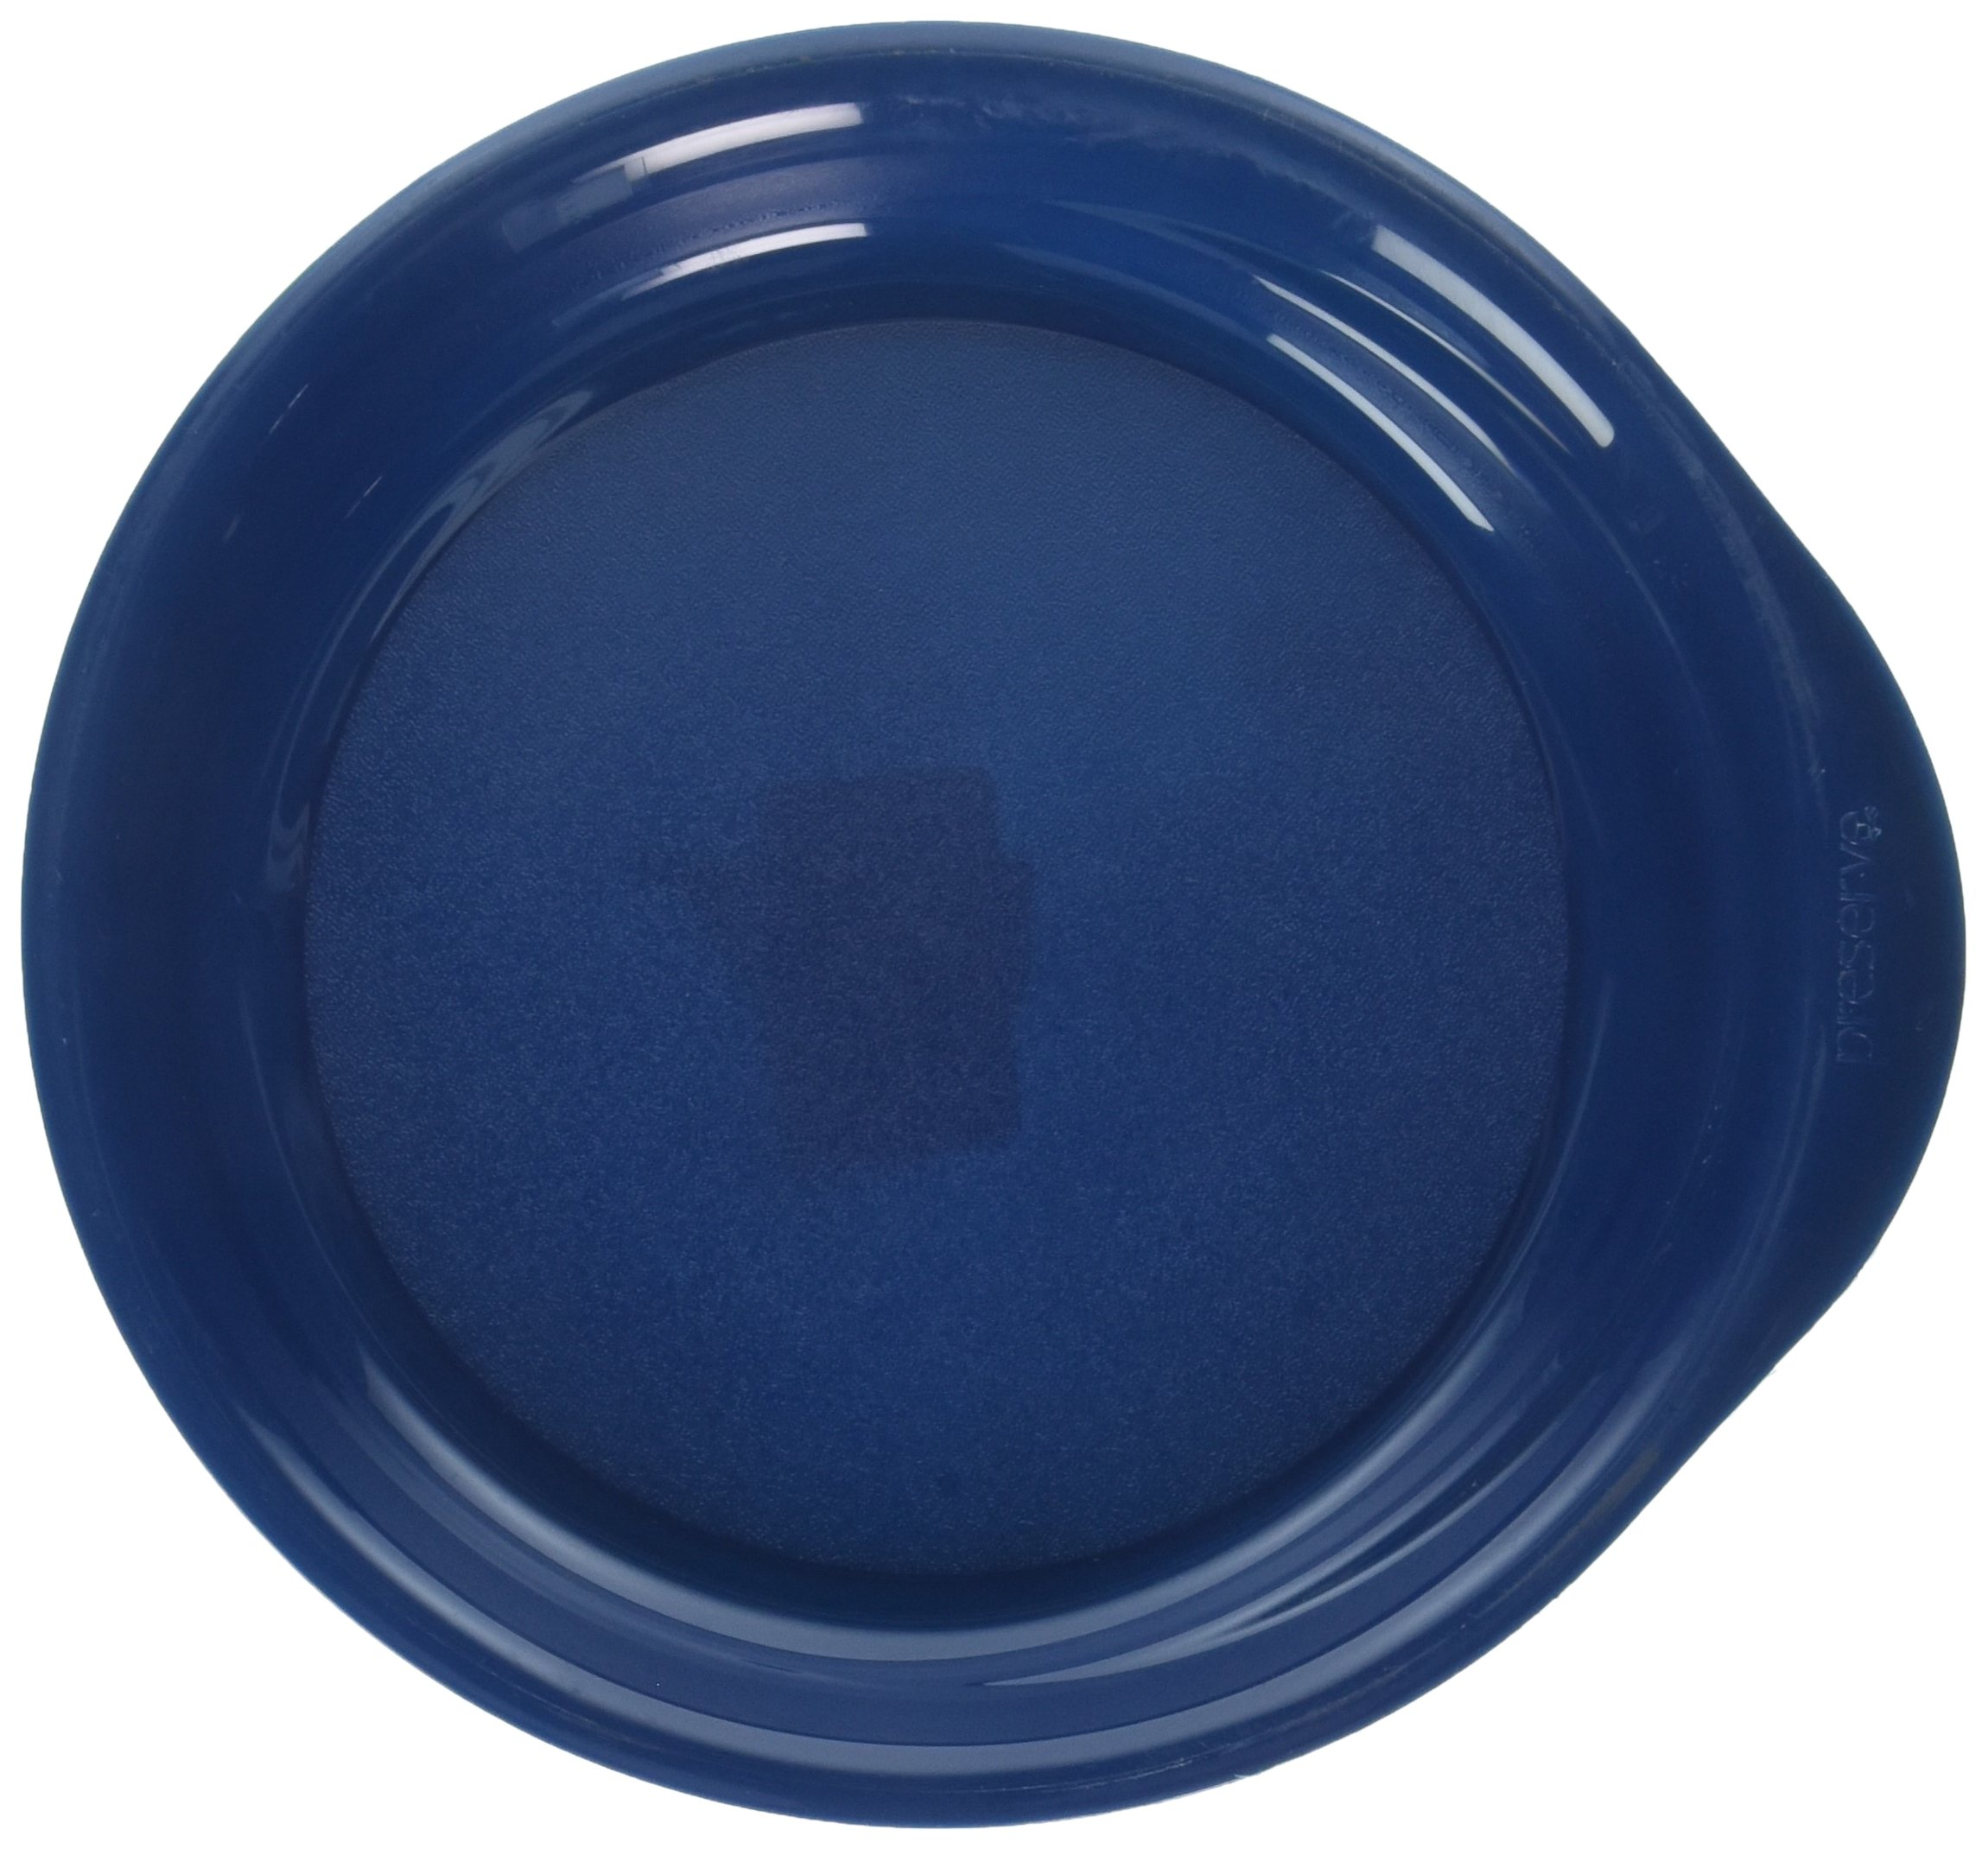 Preserve Everyday Plate, 9.5'', 4pk, Midnight Blue